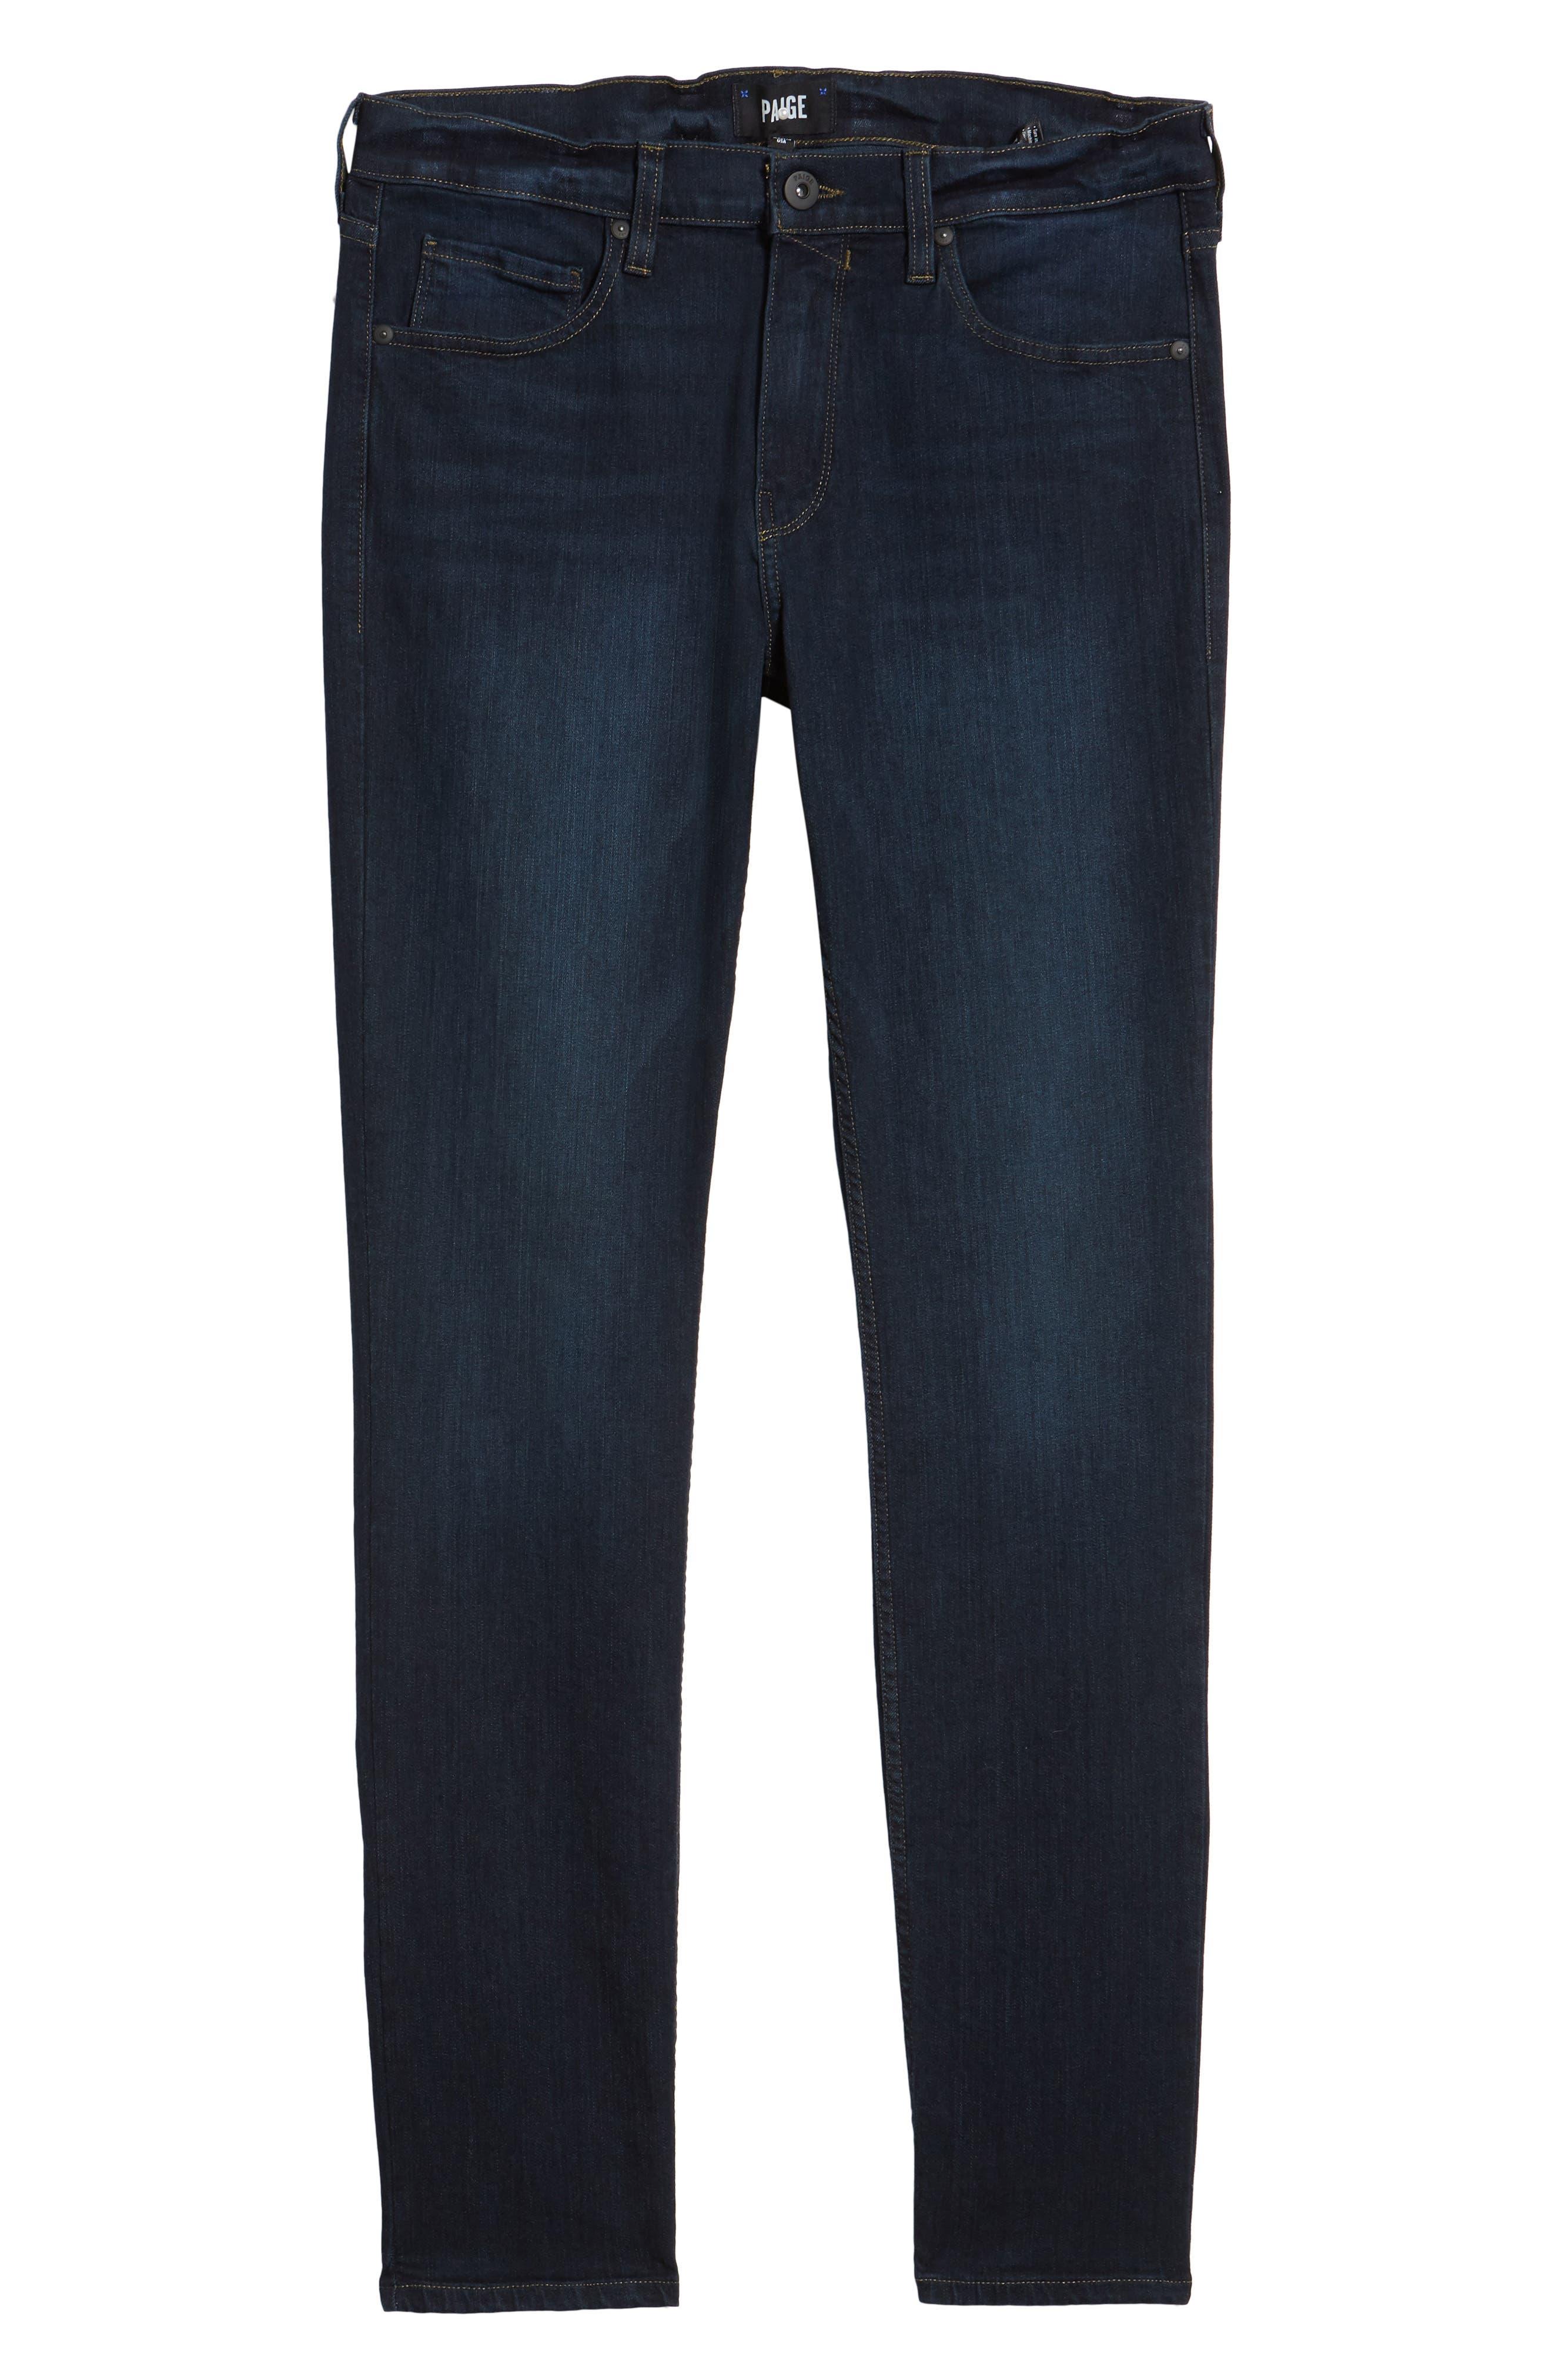 Lennox Slim Fit Jeans,                             Alternate thumbnail 6, color,                             Jonathan